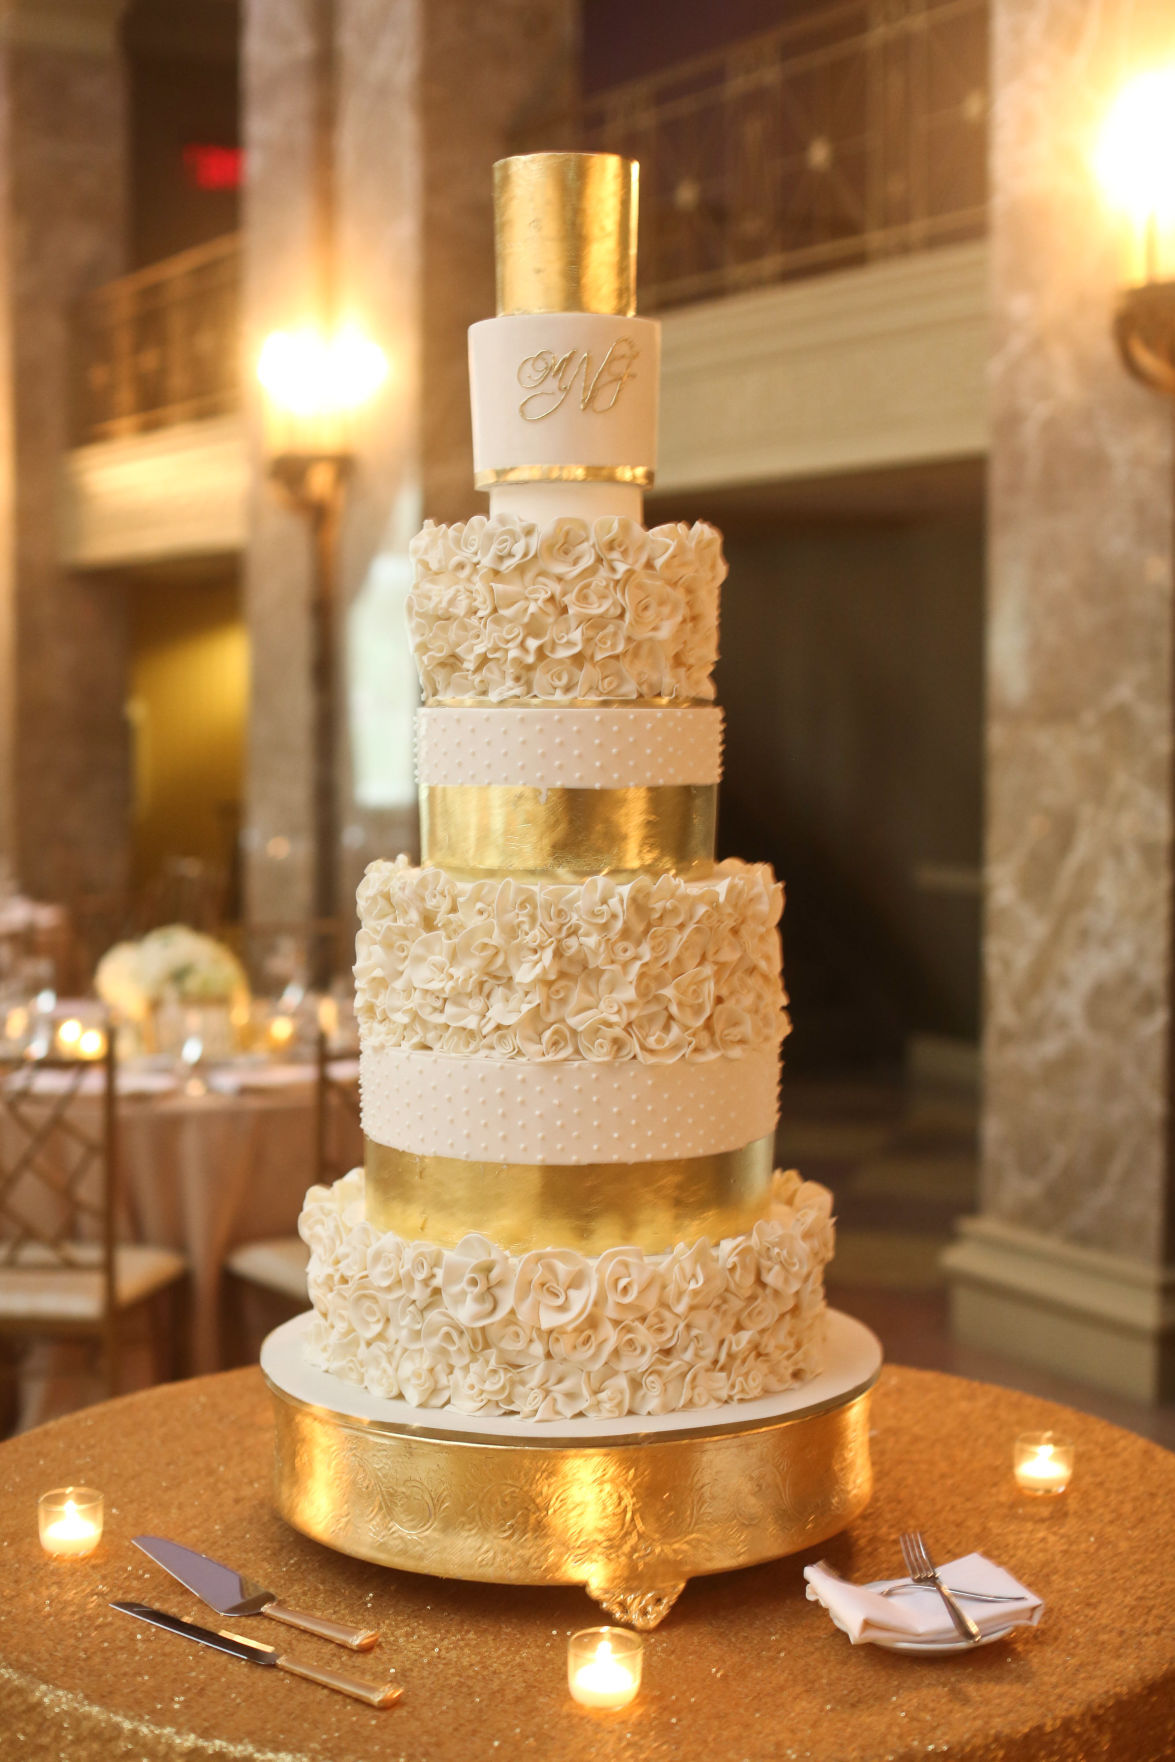 mandy cake.jpg